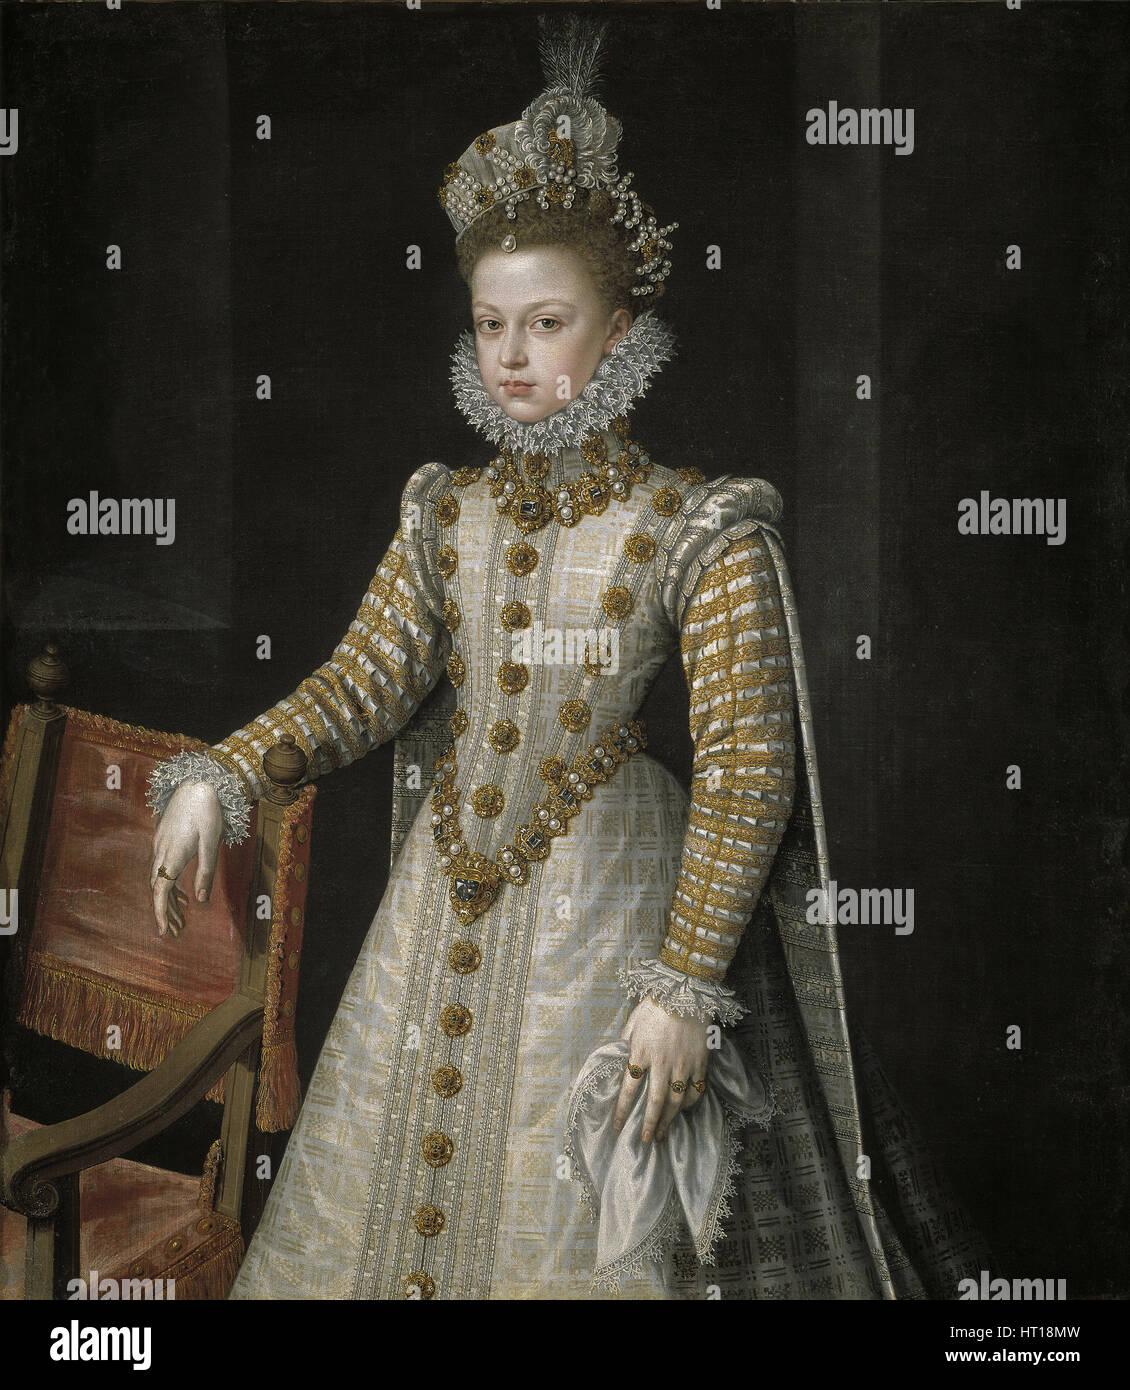 The Infanta Isabel Clara Eugenia (1566-1633), 1579. Artist: Sánchez Coello, Alonso (1531-1588) - Stock Image